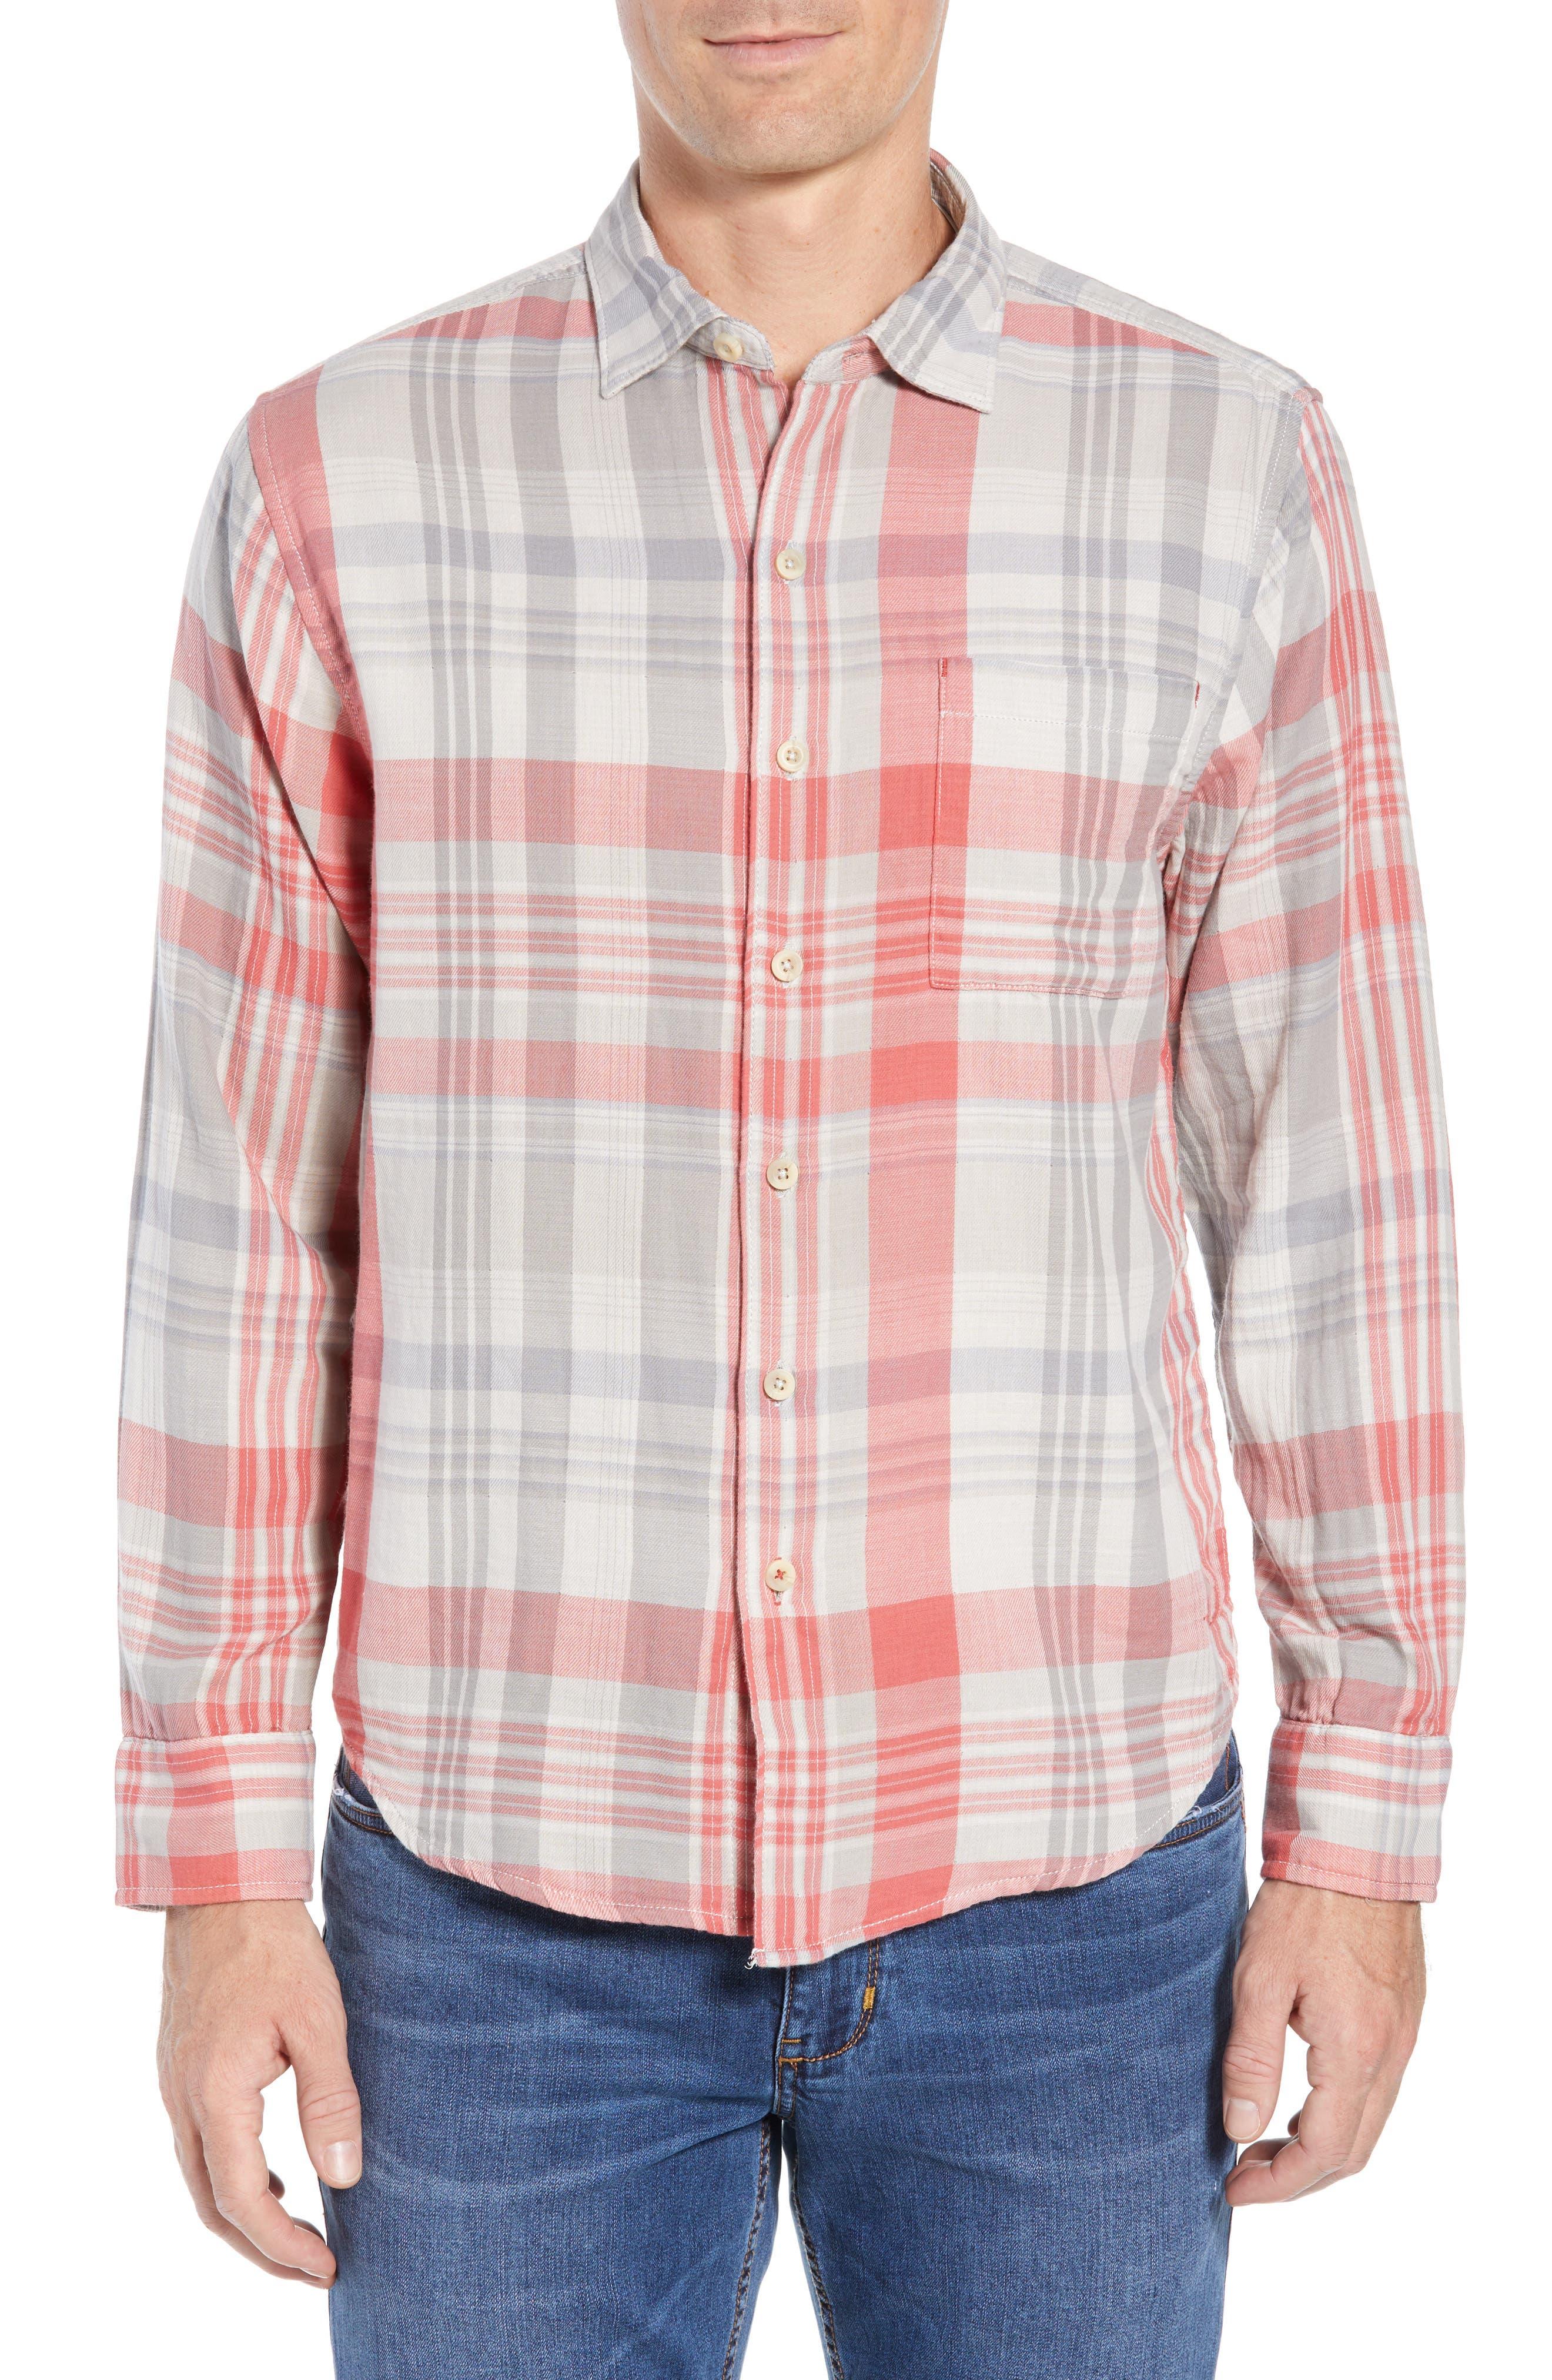 Monteverde Madras Regular Fit Shirt,                             Main thumbnail 1, color,                             POINCIANA